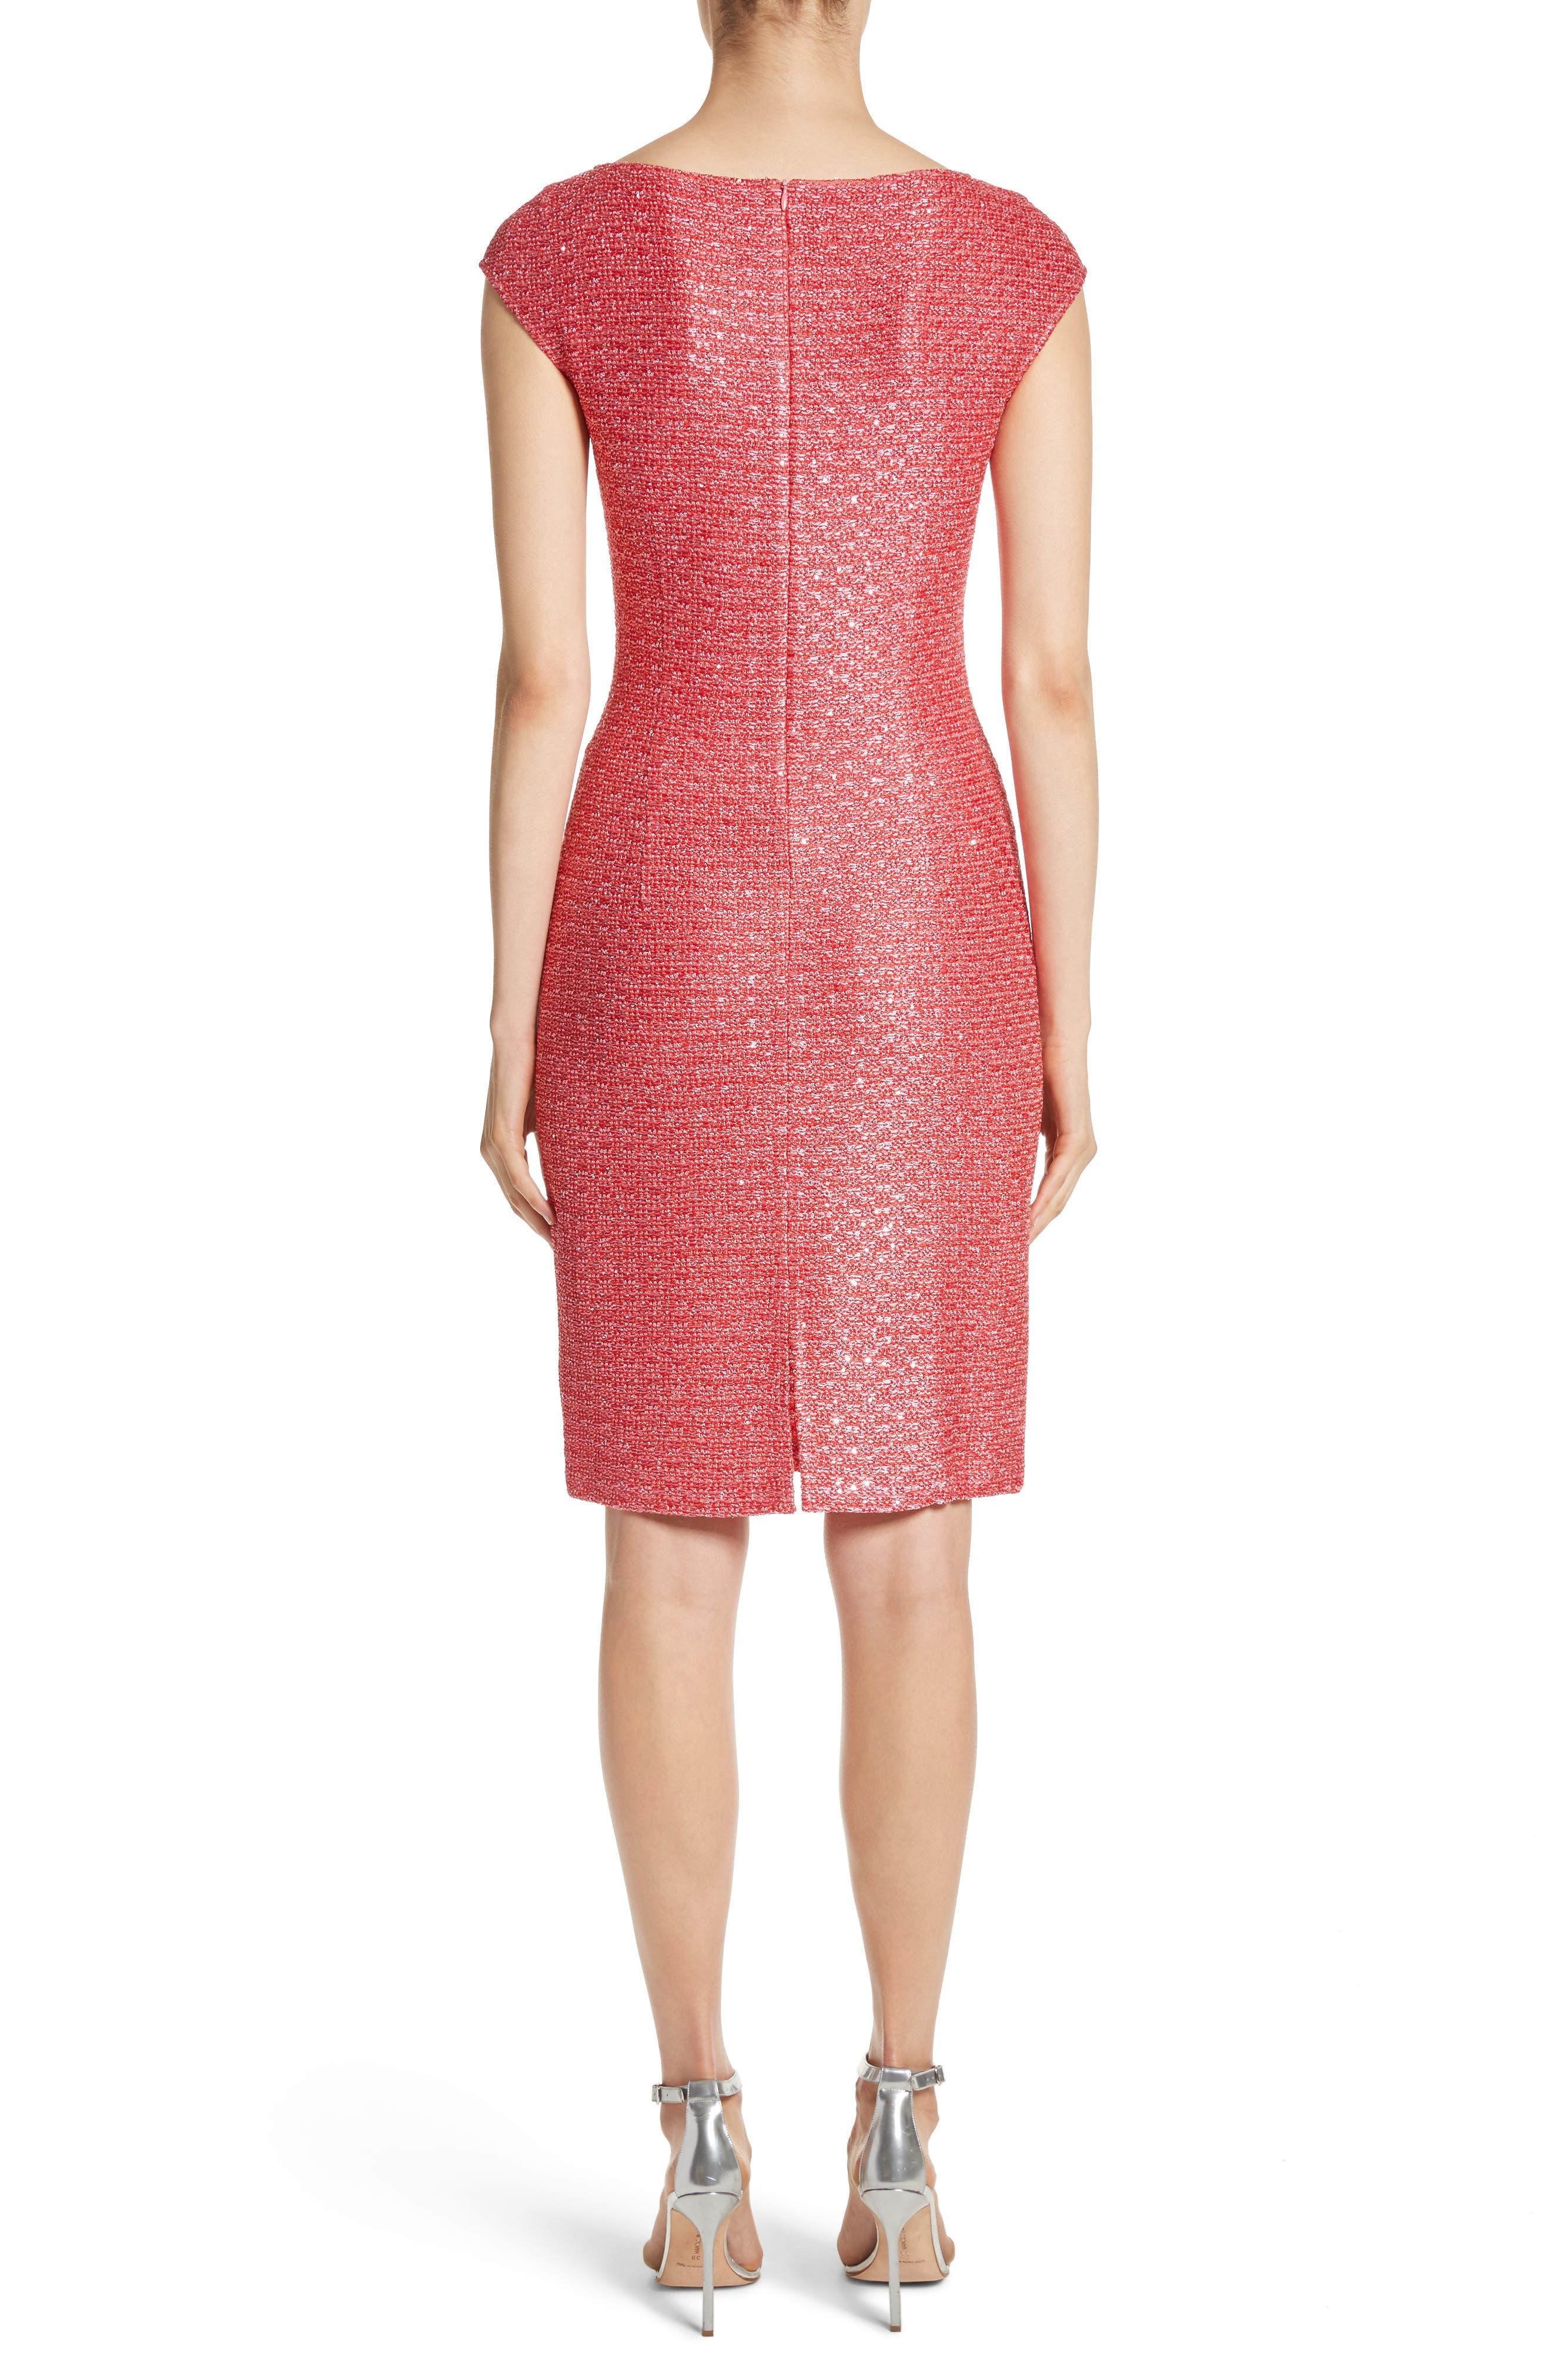 ST. JOHN COLLECTION,                             Hansh Knit Dress,                             Alternate thumbnail 2, color,                             950